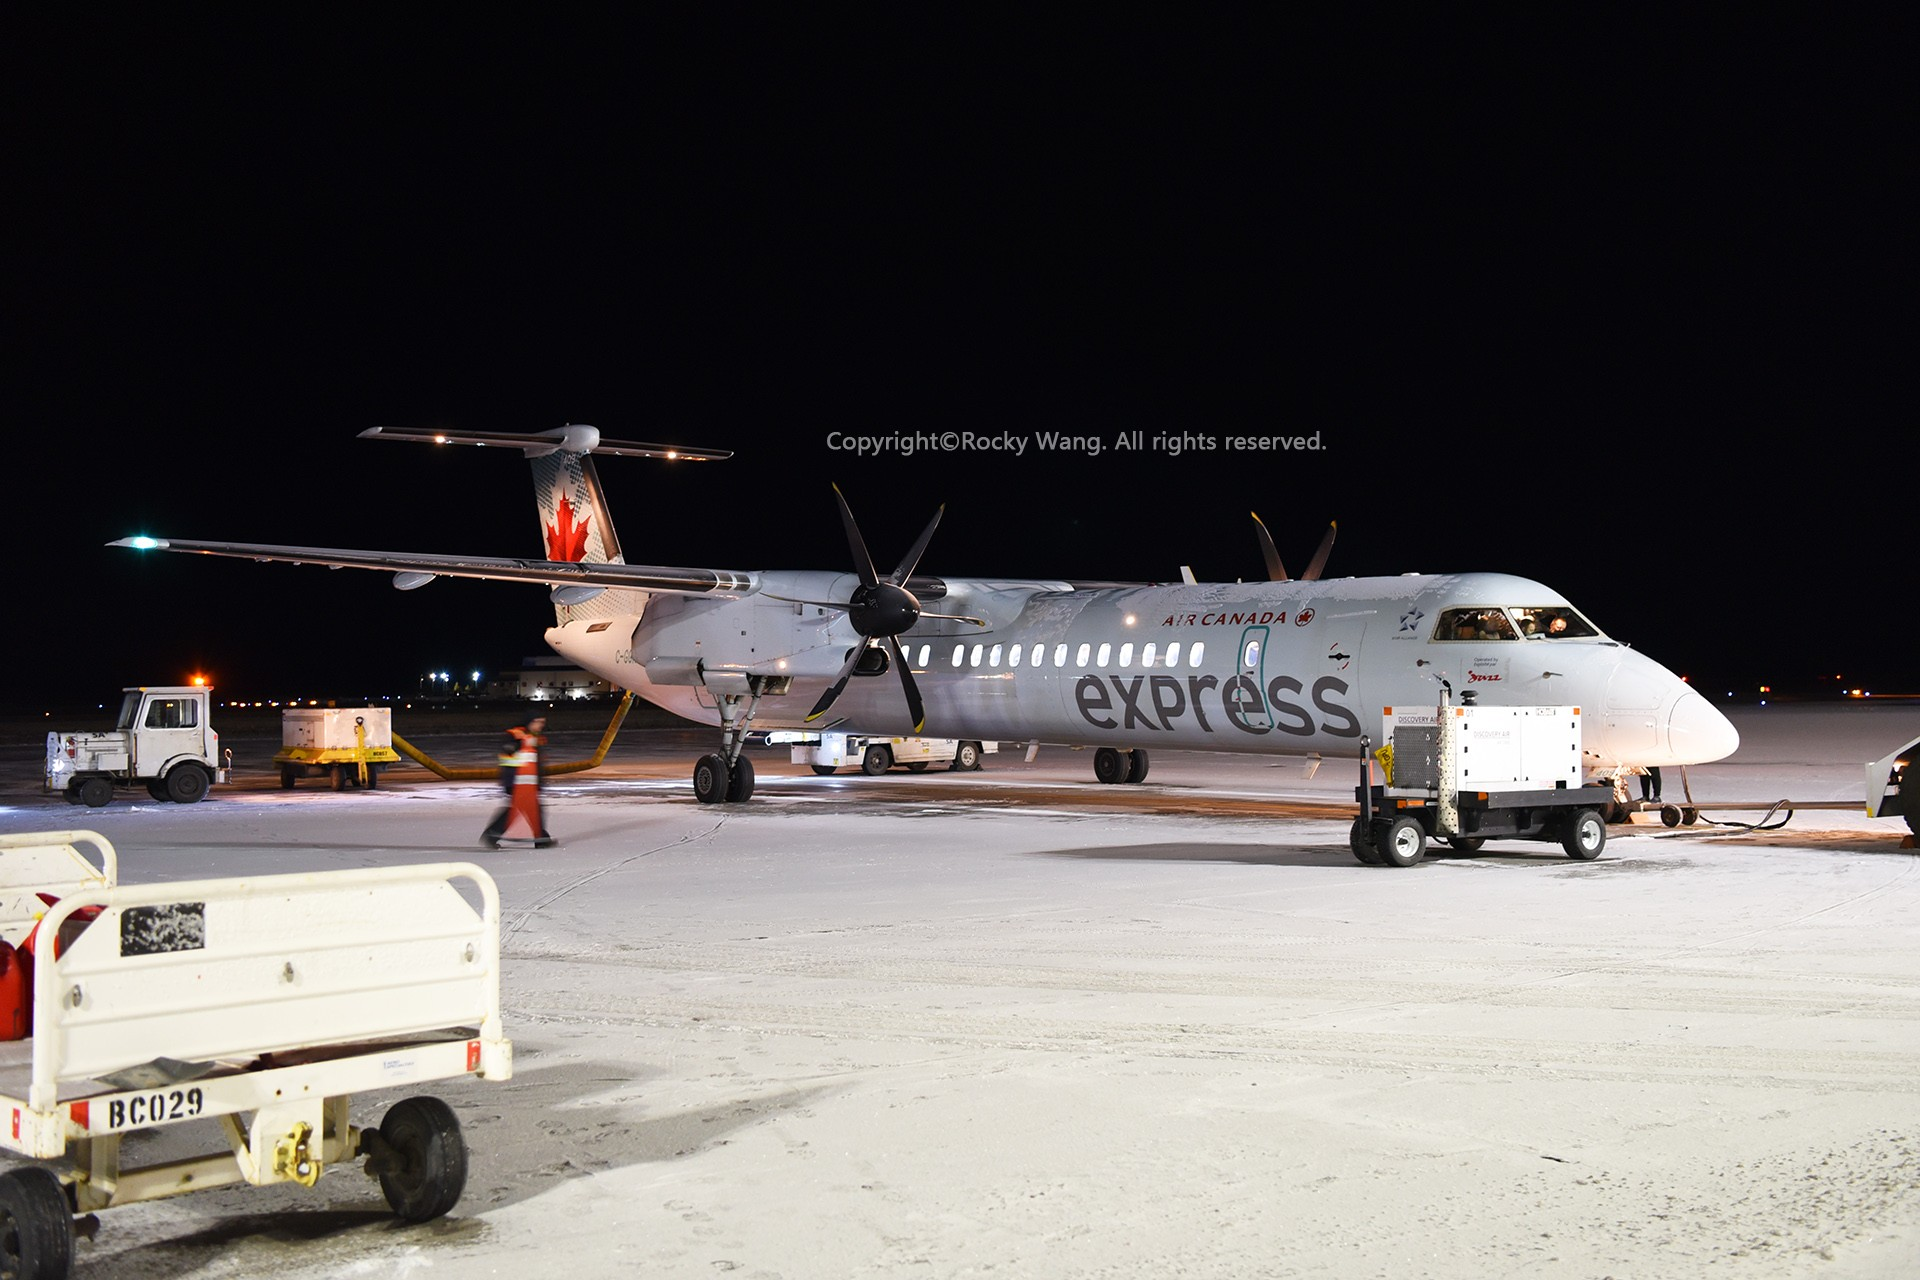 Re:[原创]简易版游记,纪念一次30段的环球飞行和一些碎碎念 BOMBARDIER DASH 8-Q402 C-GGNF Yellowknife Airport